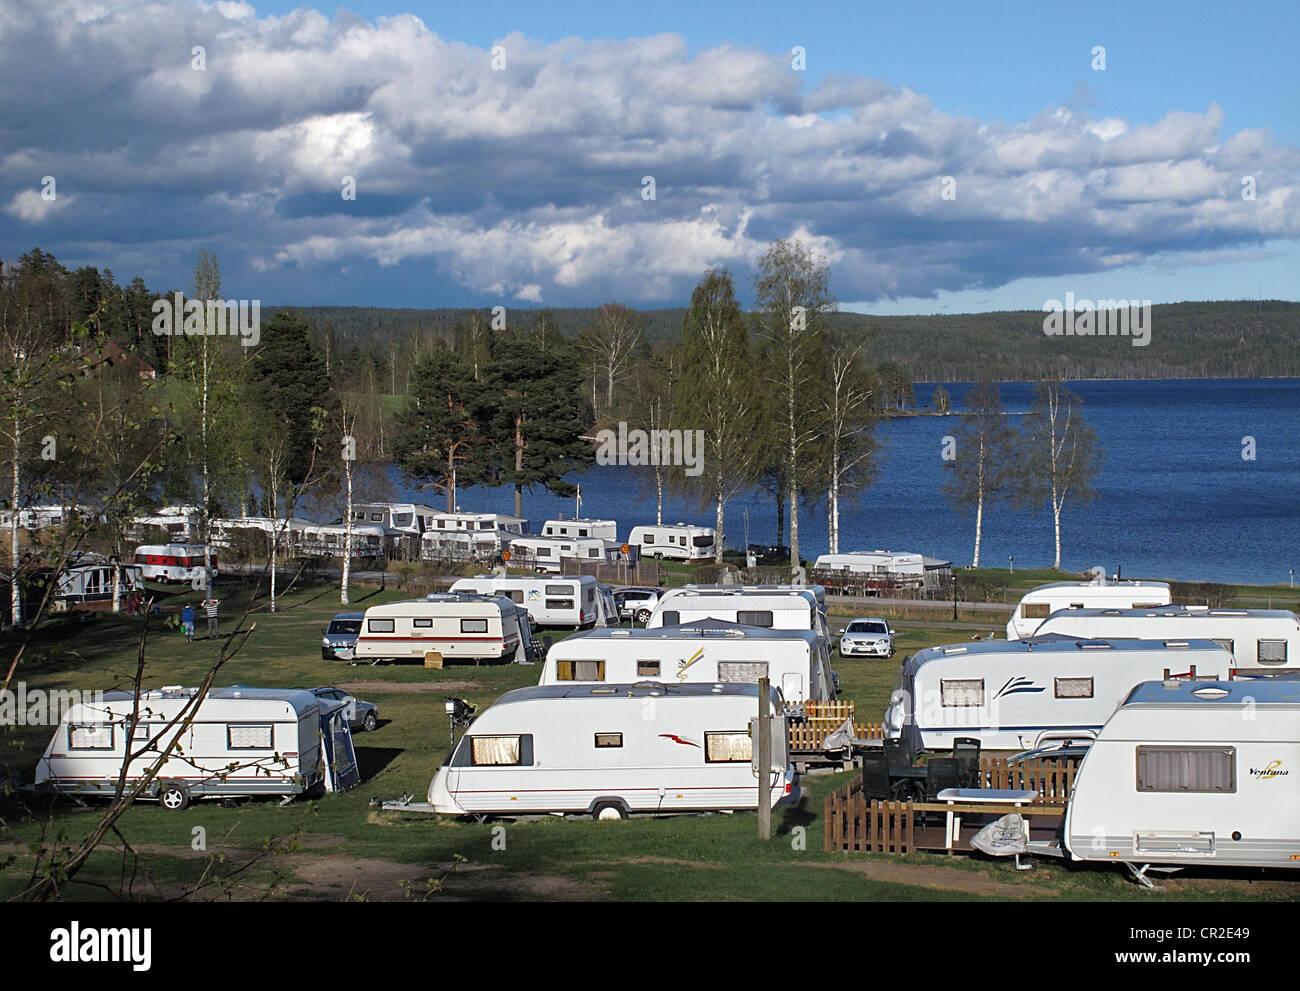 Dans les remorques de camping Ekeby par Västra Silen lake, Årjäng, Värmland, Suède Photo Stock